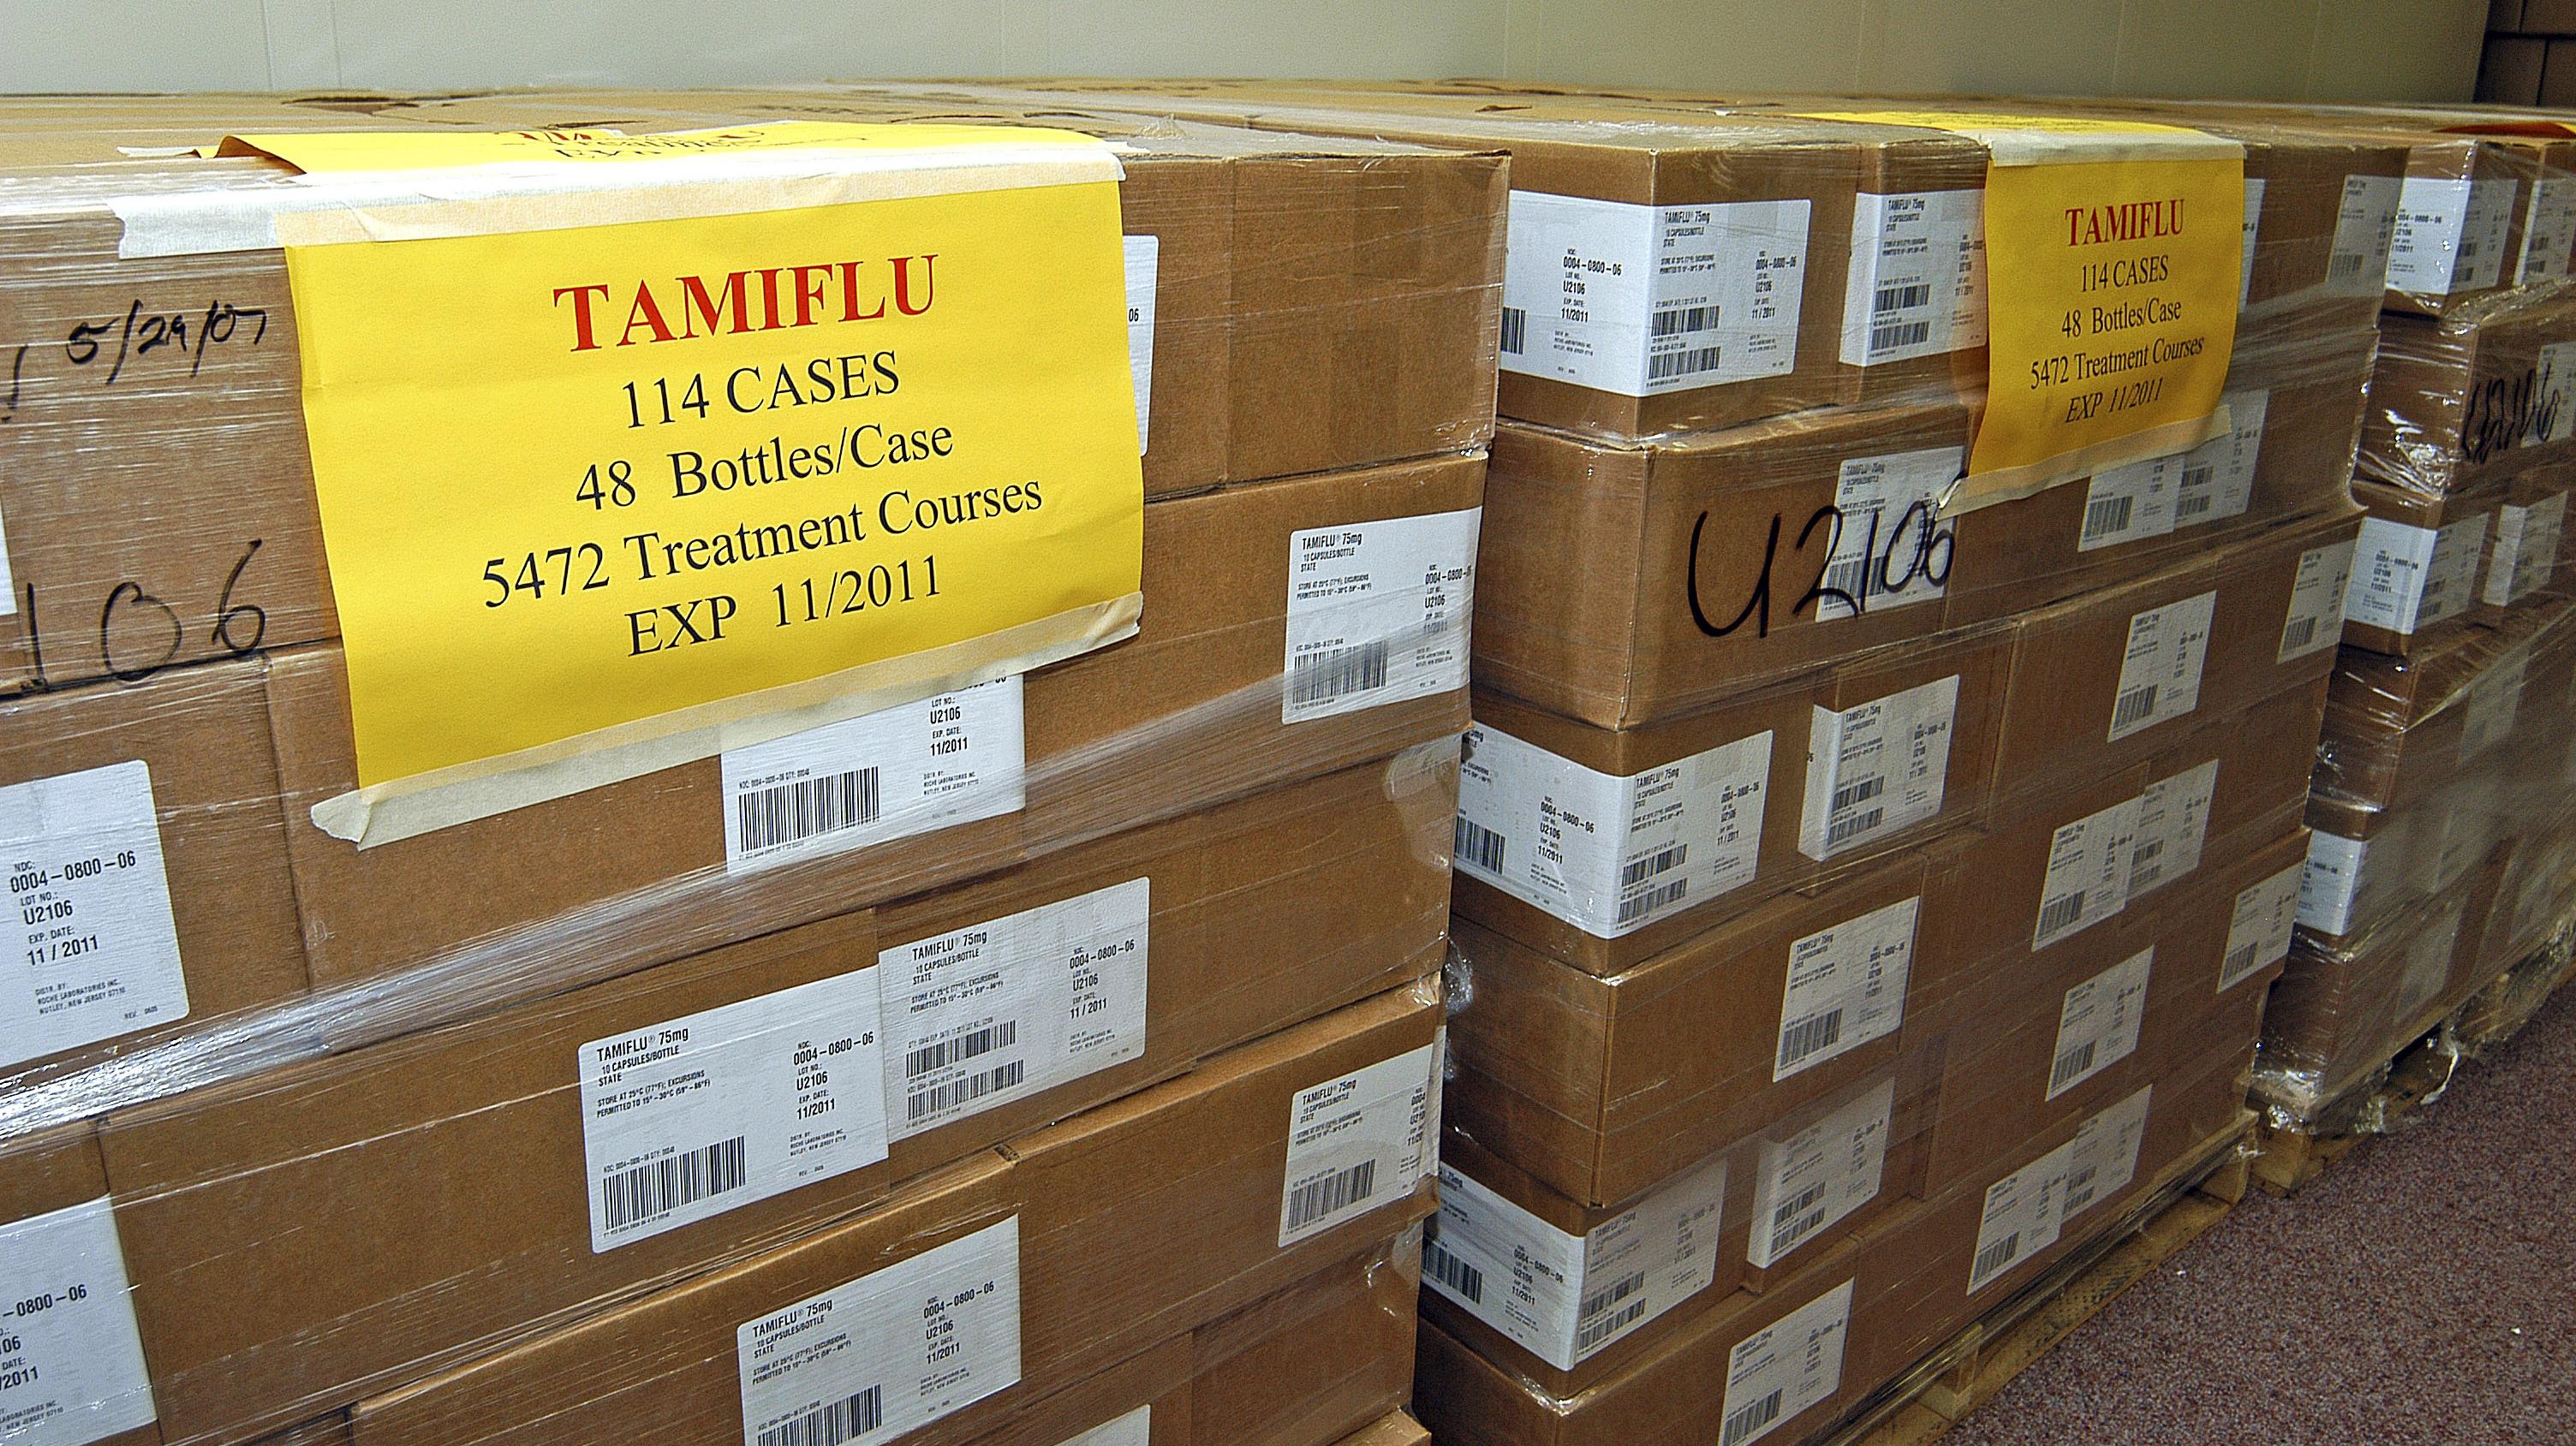 Flu Drugs Saved Lives During 2009 Pandemic